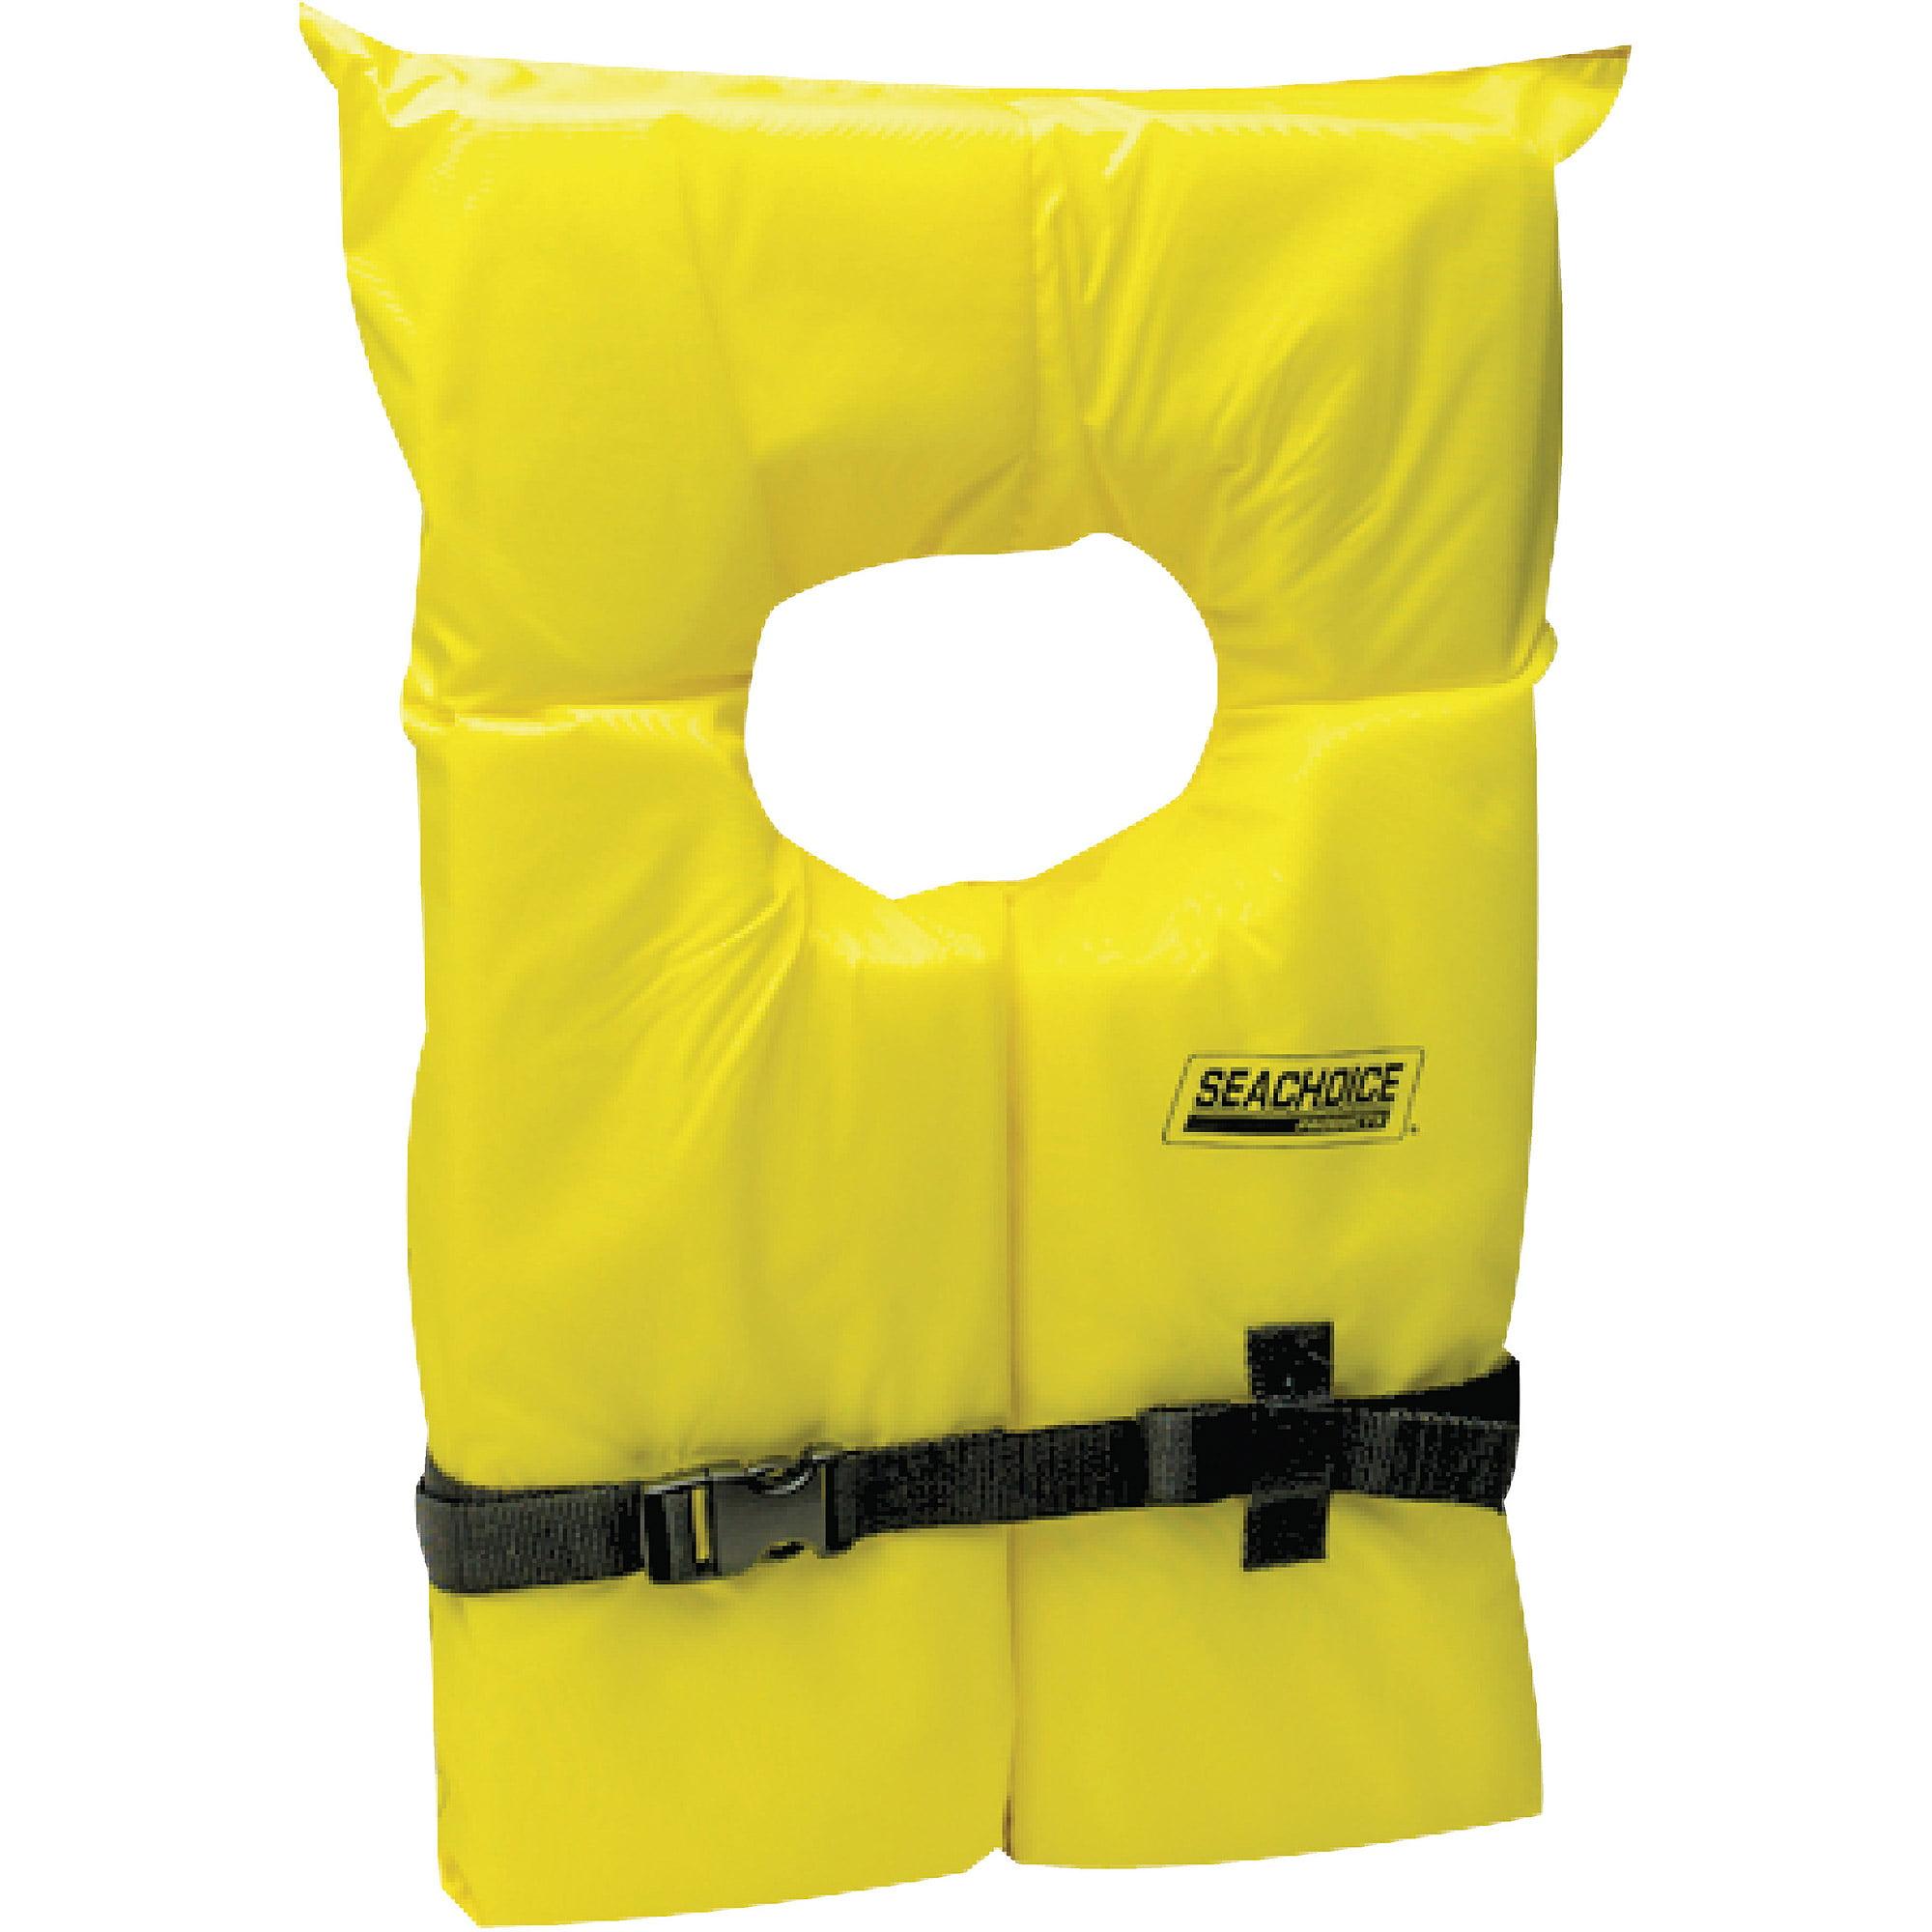 Seachoice Universal Type II Yellow Life Vest